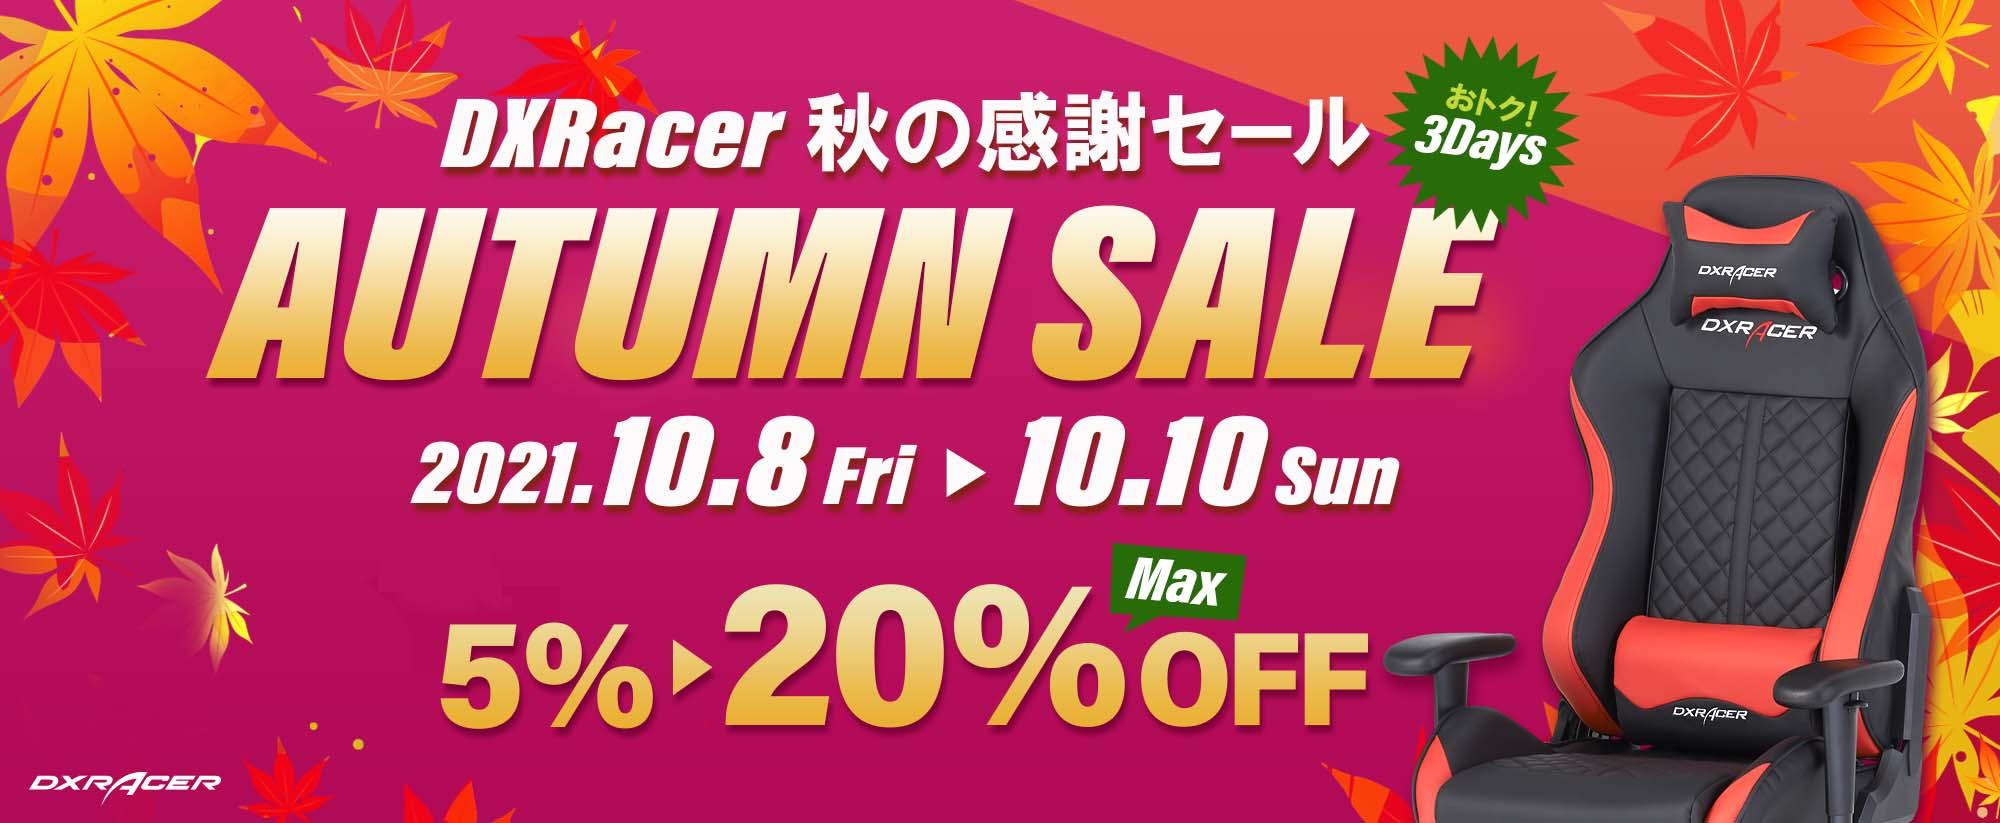 DXRacer秋の感謝セール開催